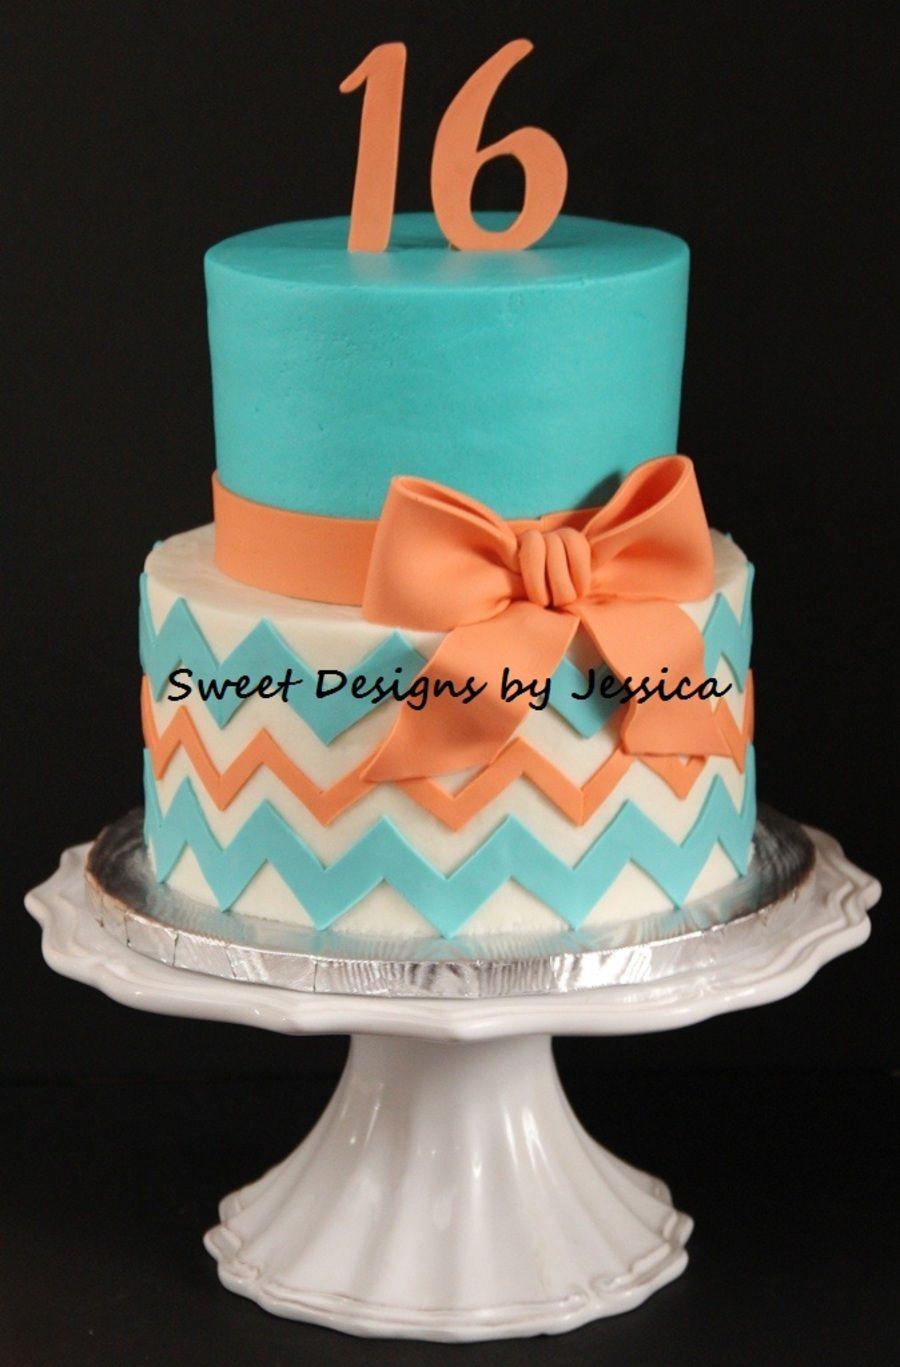 Design Tips Inspiration Arrow Cake and Inspiration